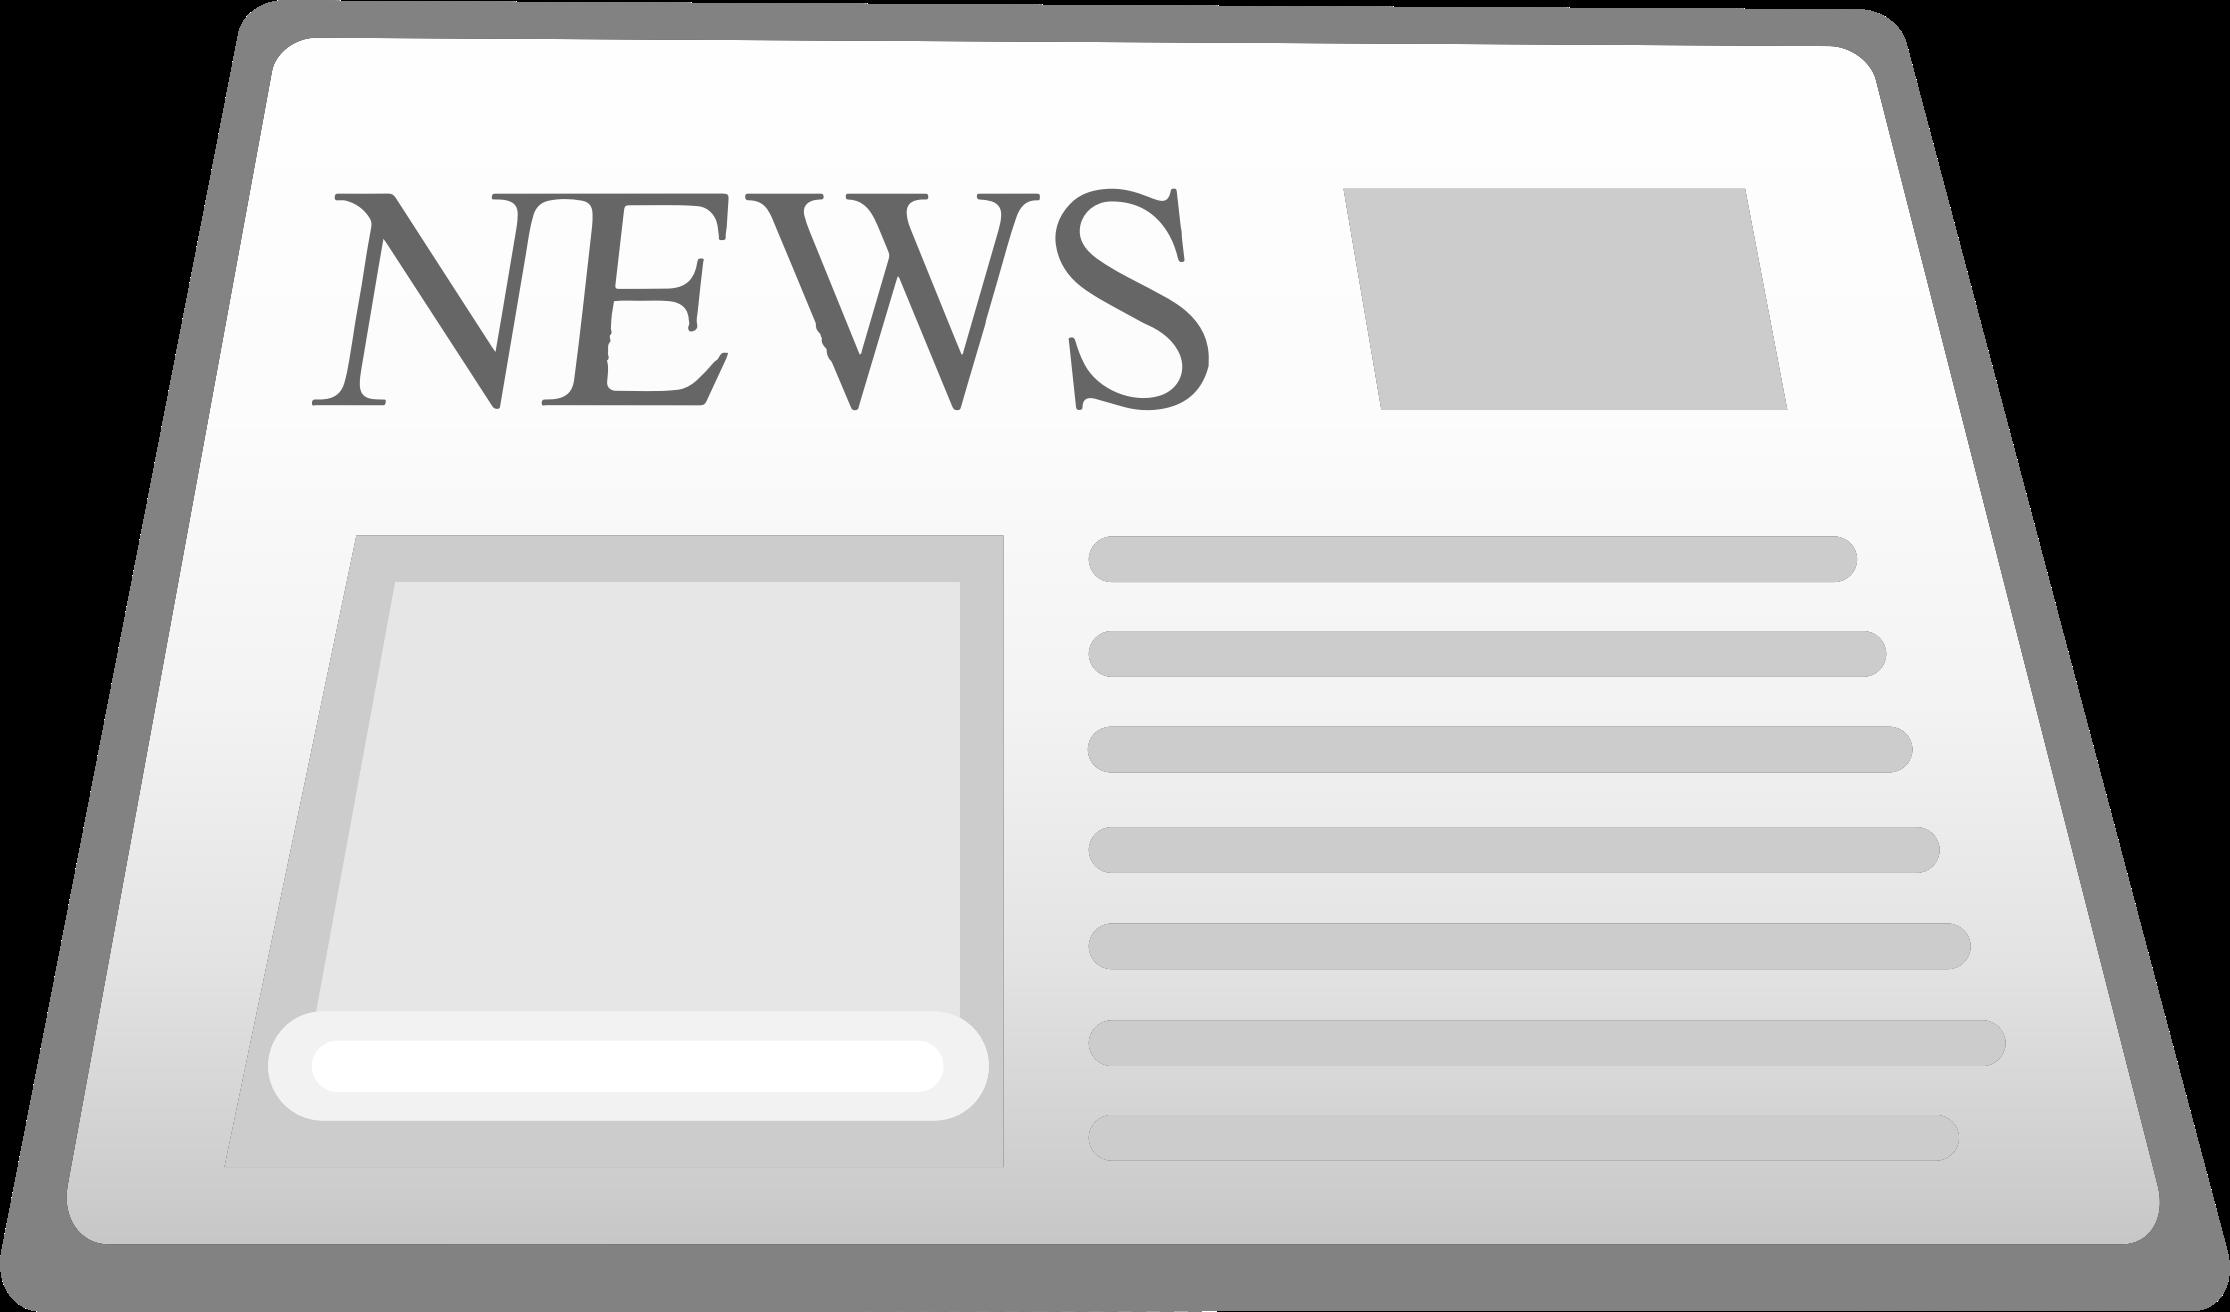 News clipart news update. Newspaper icon big image